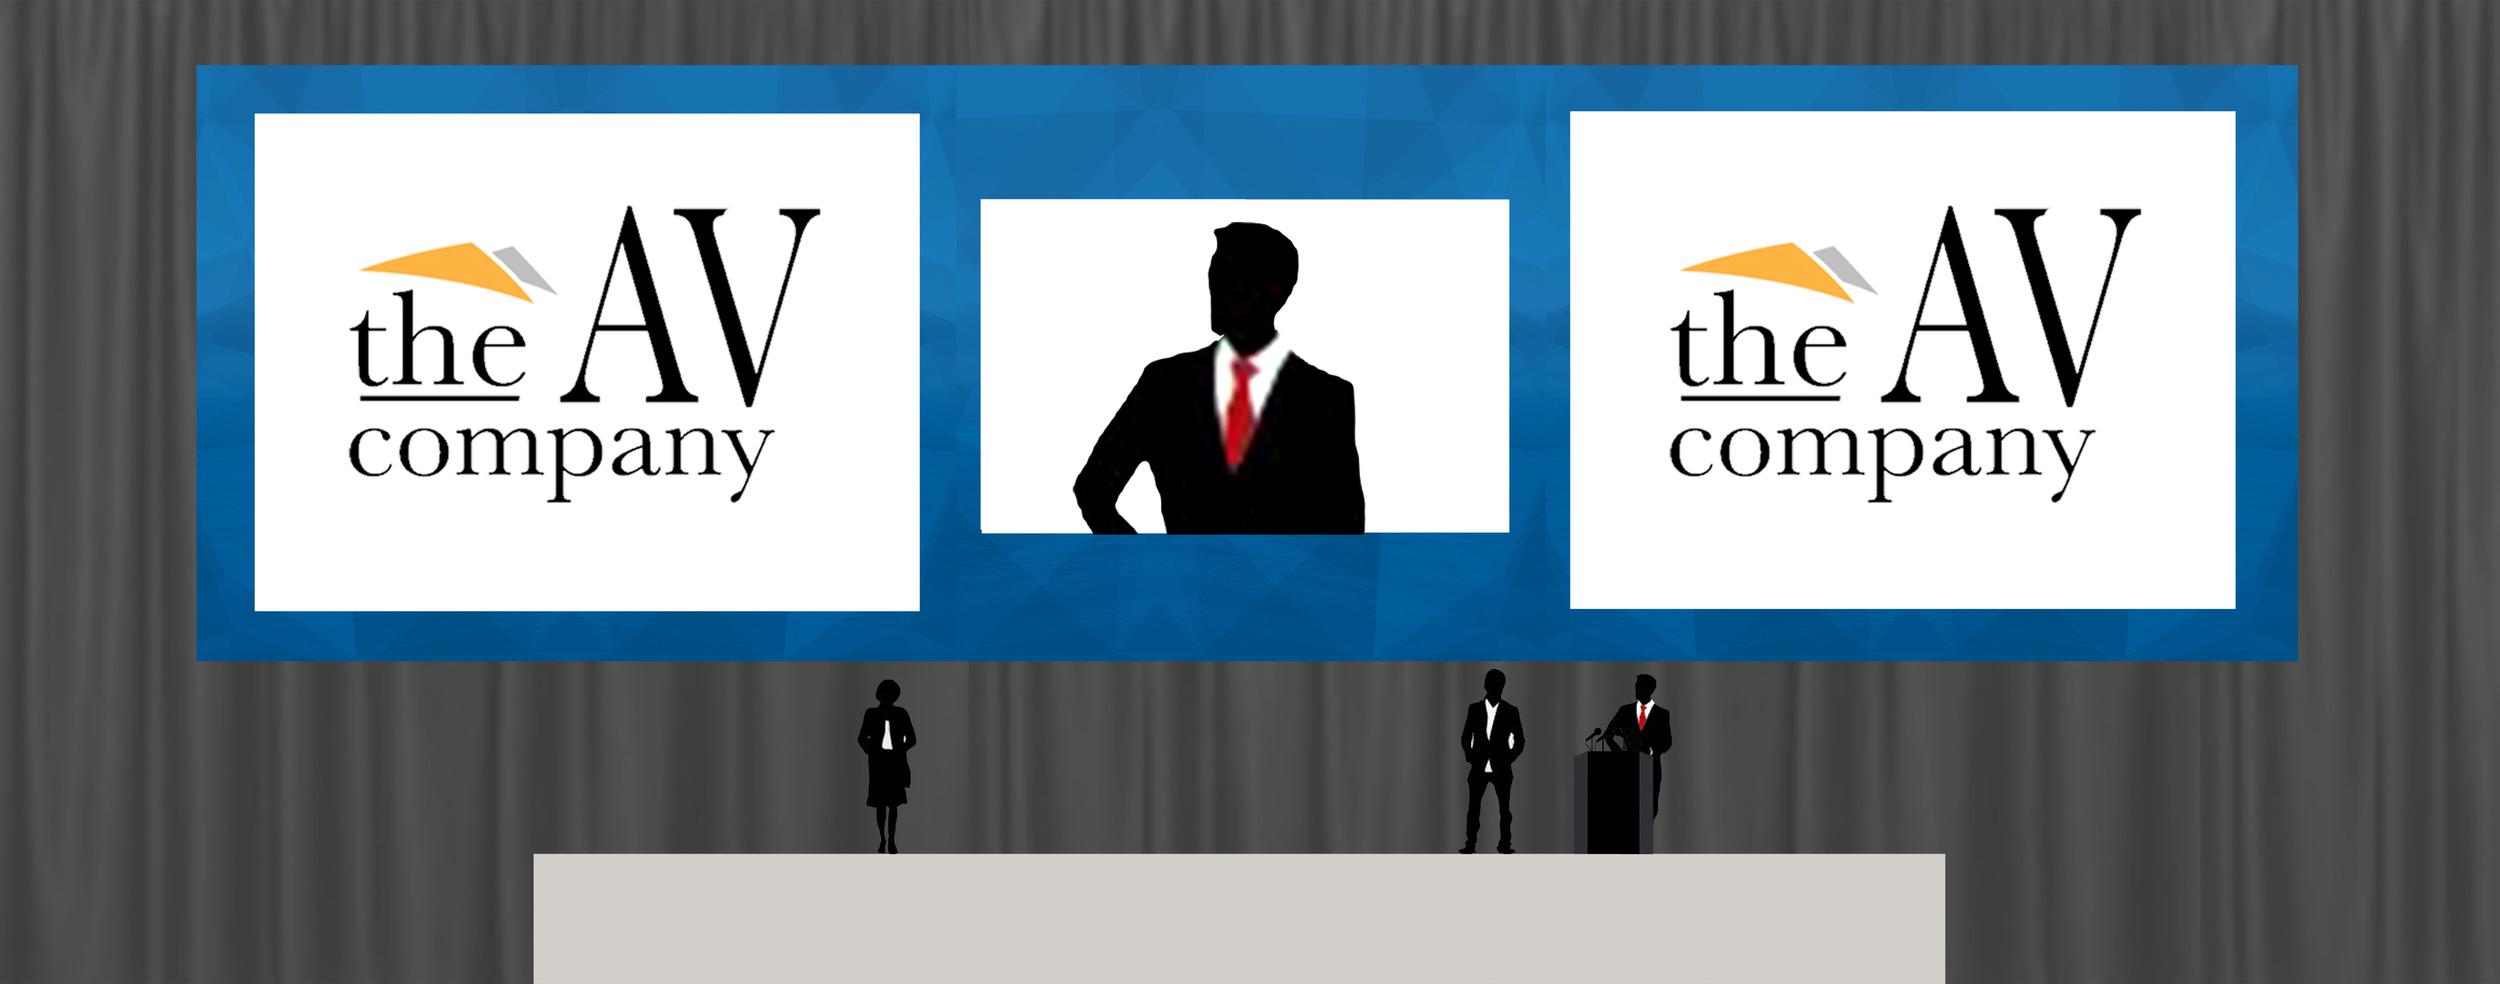 John-Paul-Jones-Arena-UVA-Event-Audio-Visual-The-AV-Company2.jpg